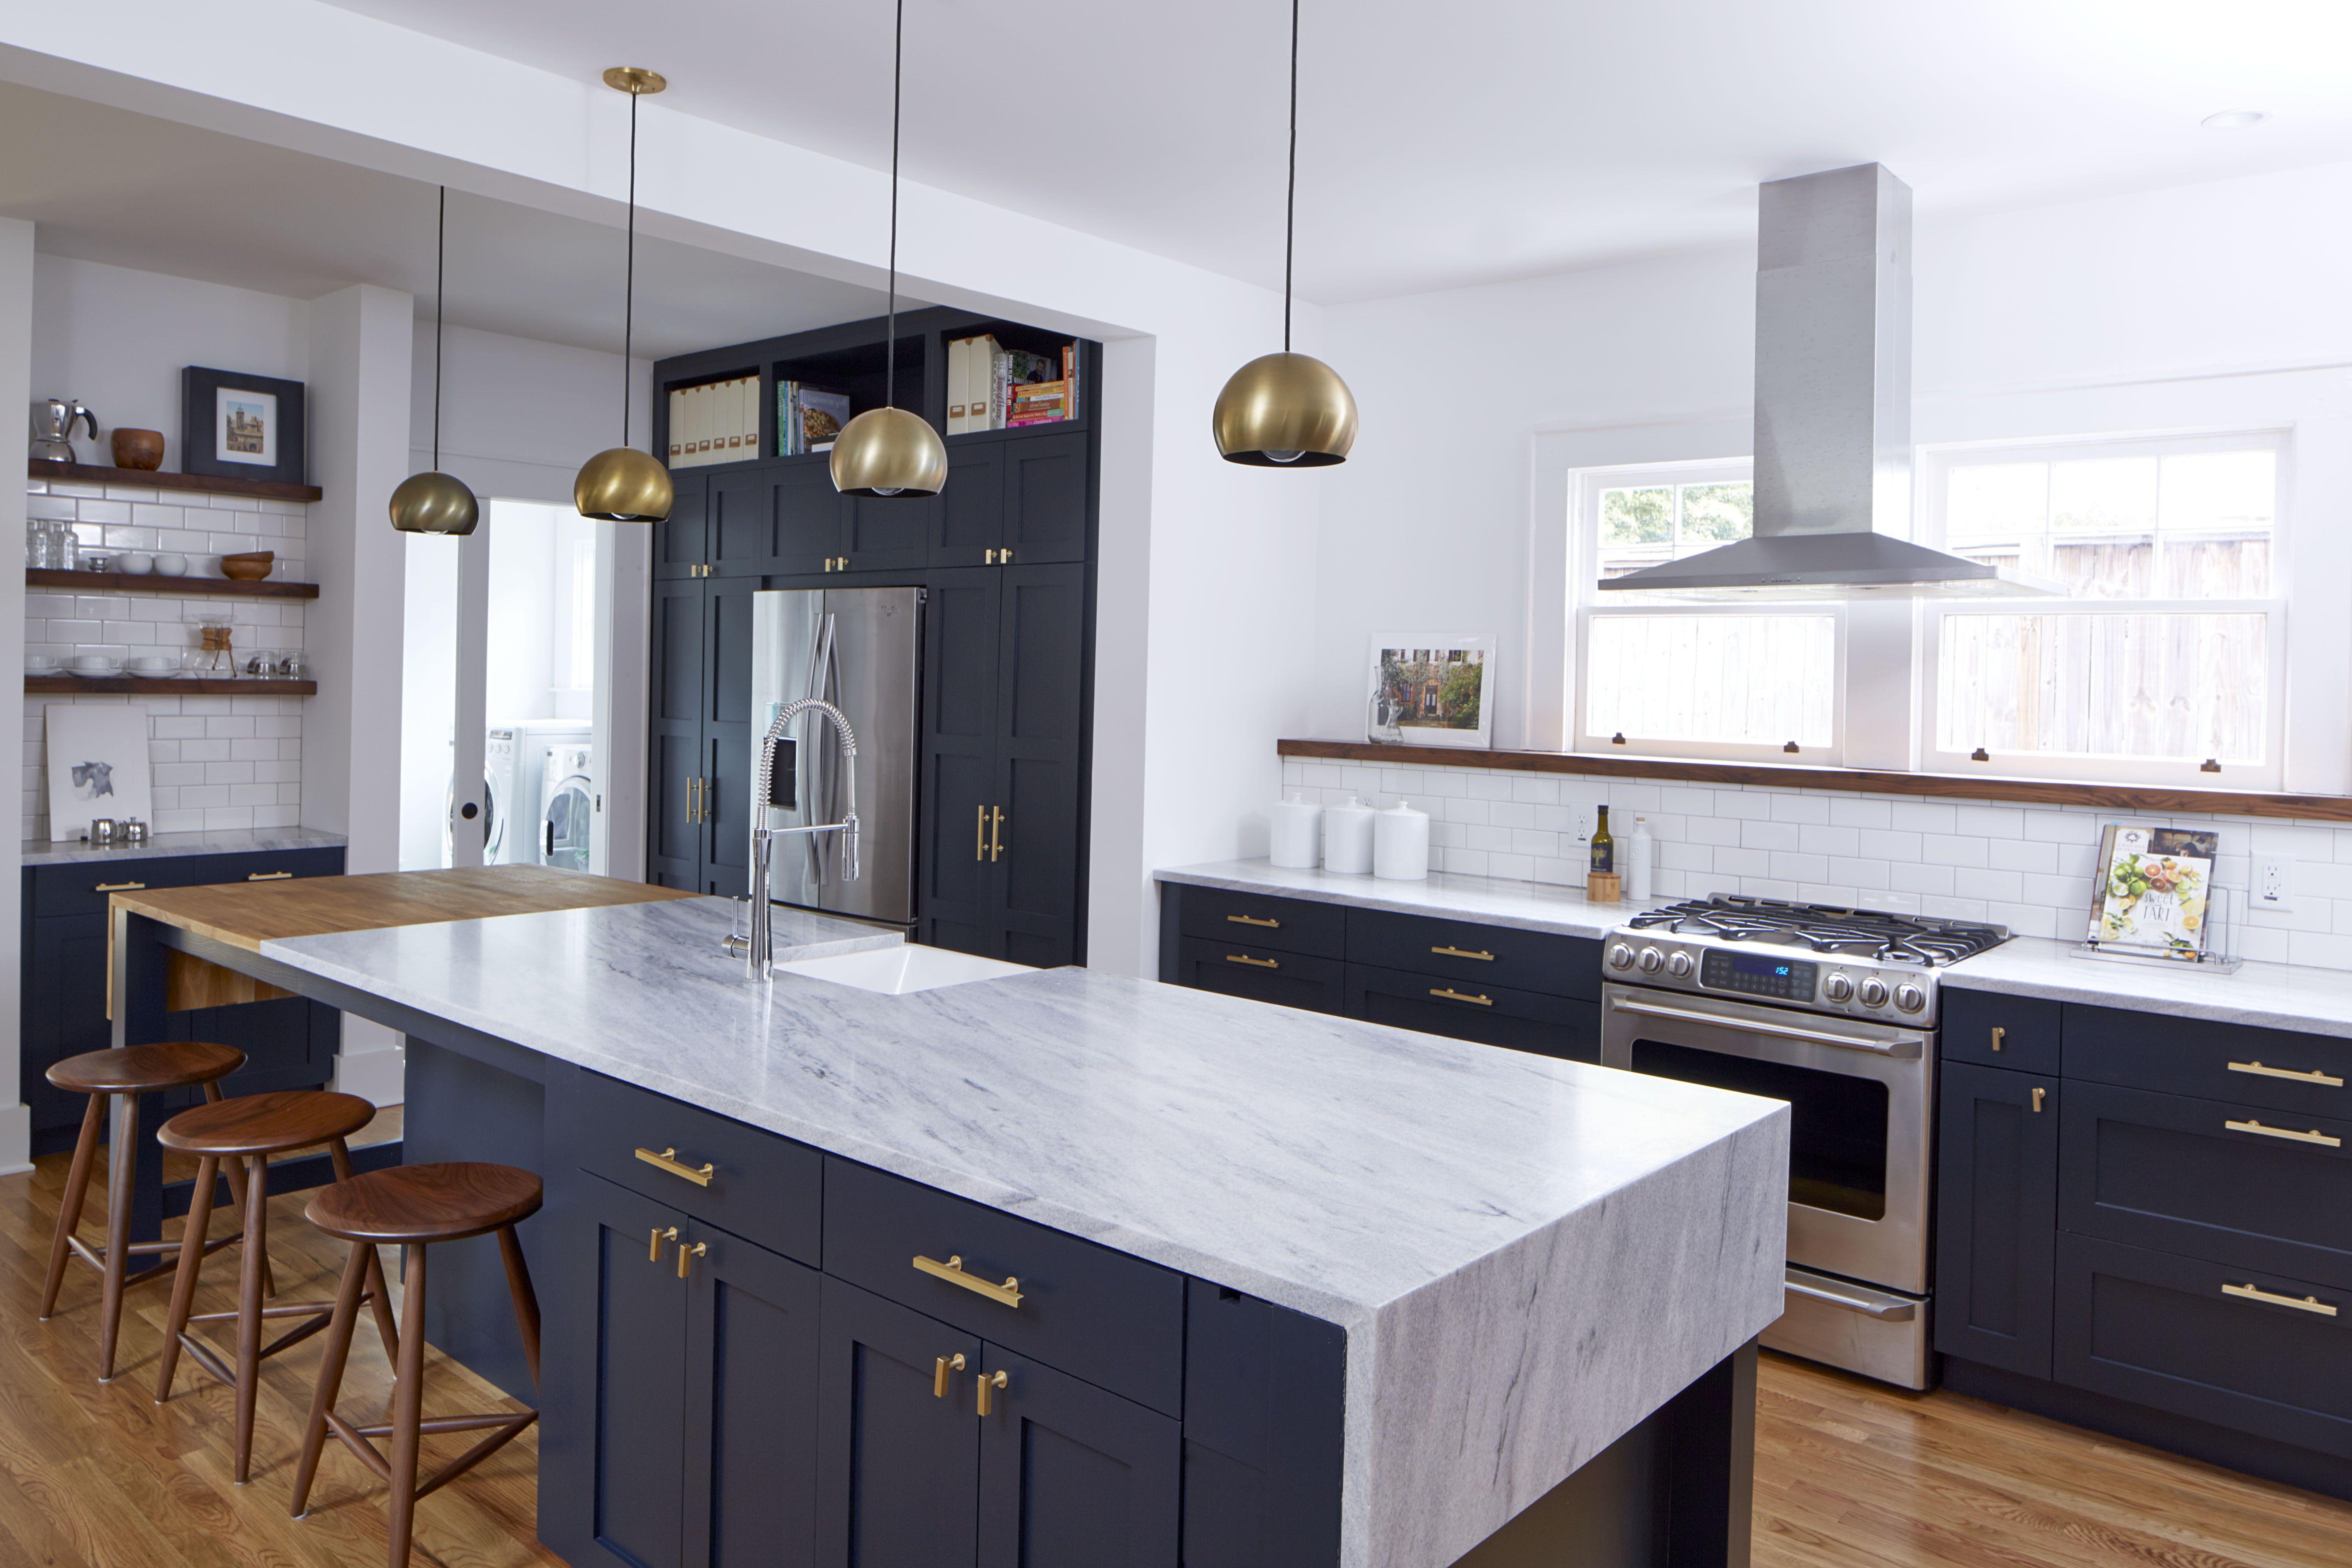 Kitchen kitchen design ideas pinterest georgia marbles and